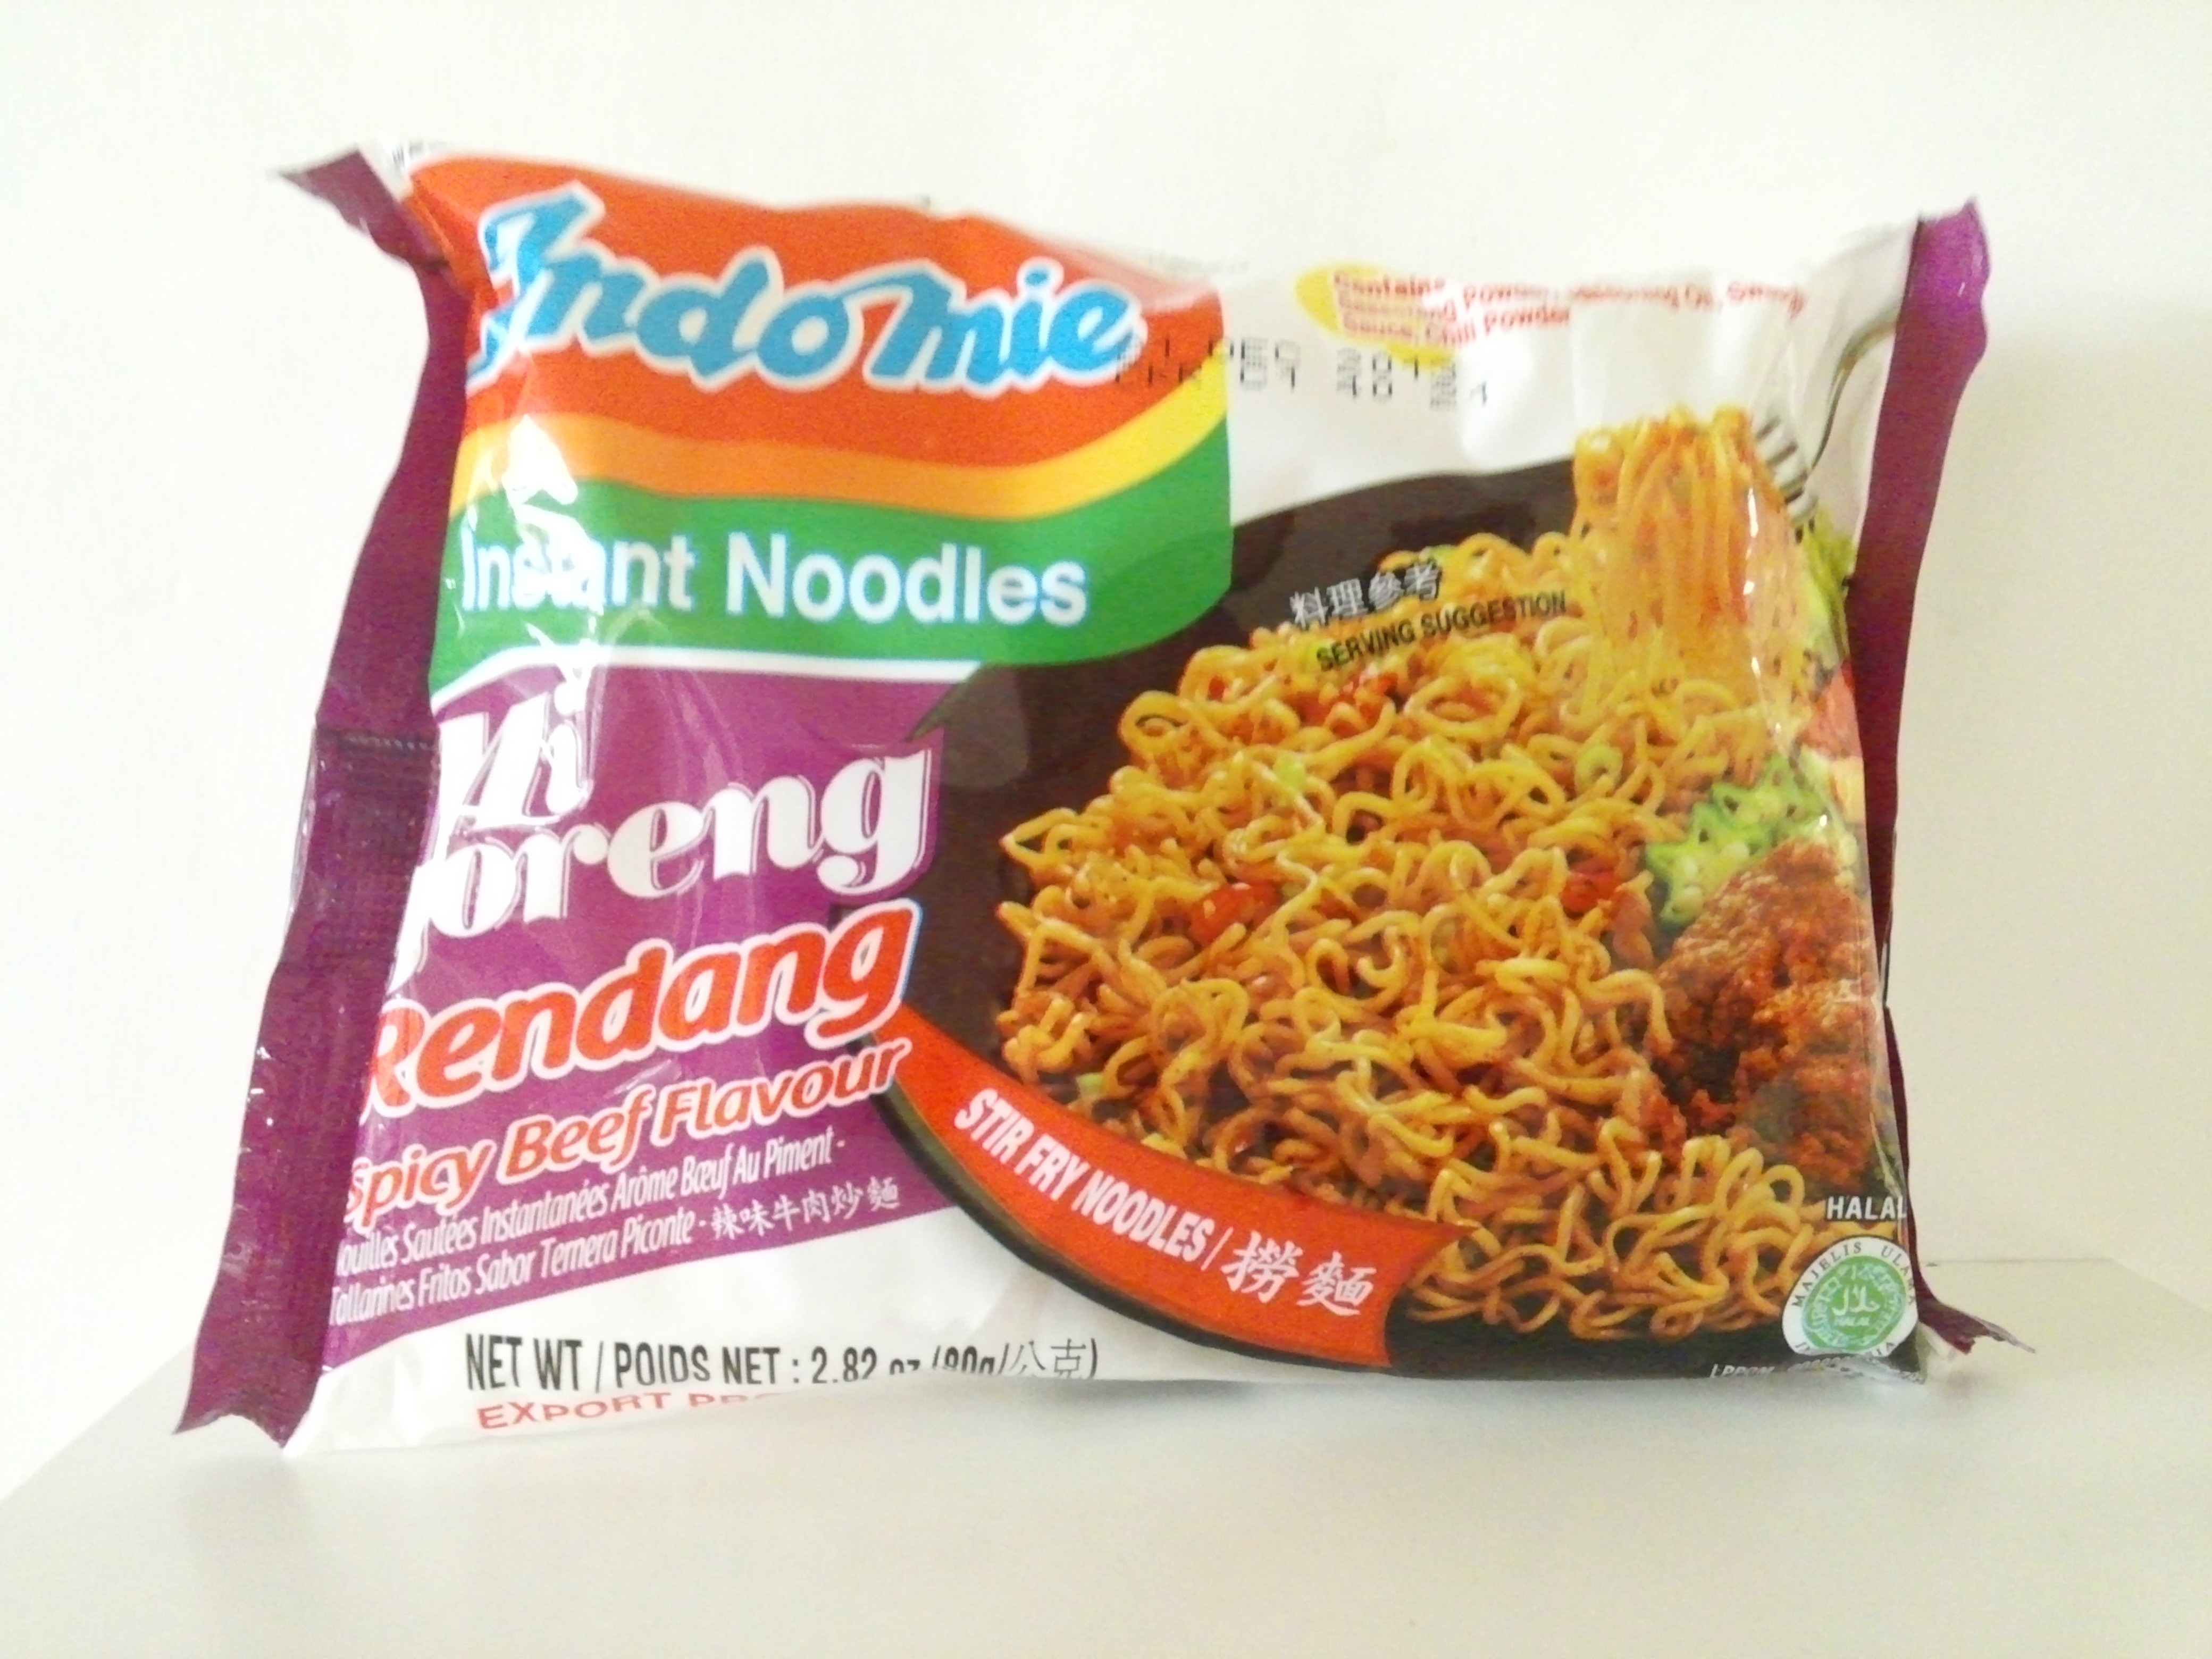 Indomie Spicy Beef Flavour Instant Noodles 2.82 oz